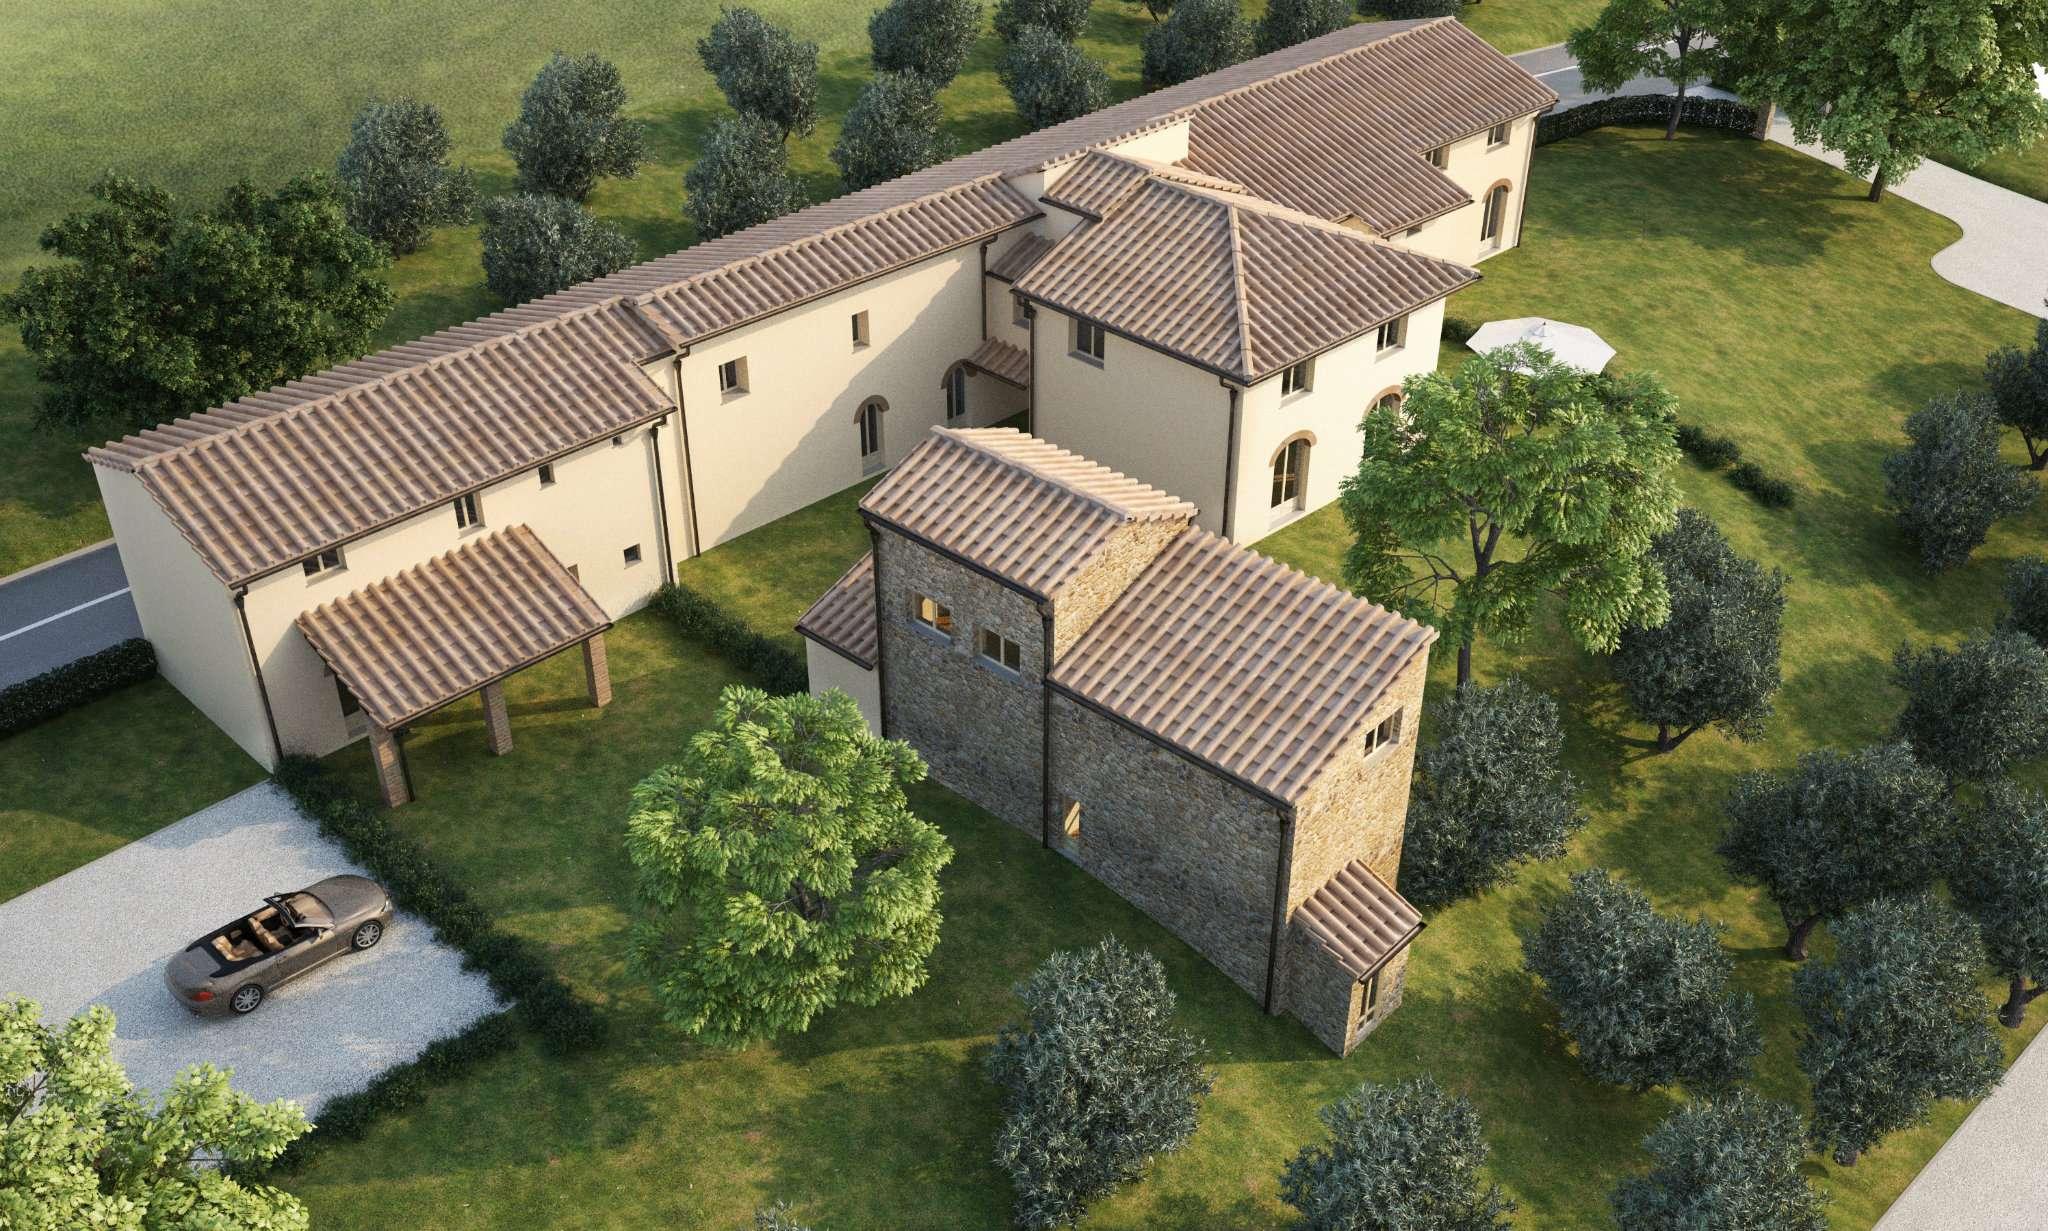 Immobiliare centostelle a firenze casa for Case in vendita scandicci